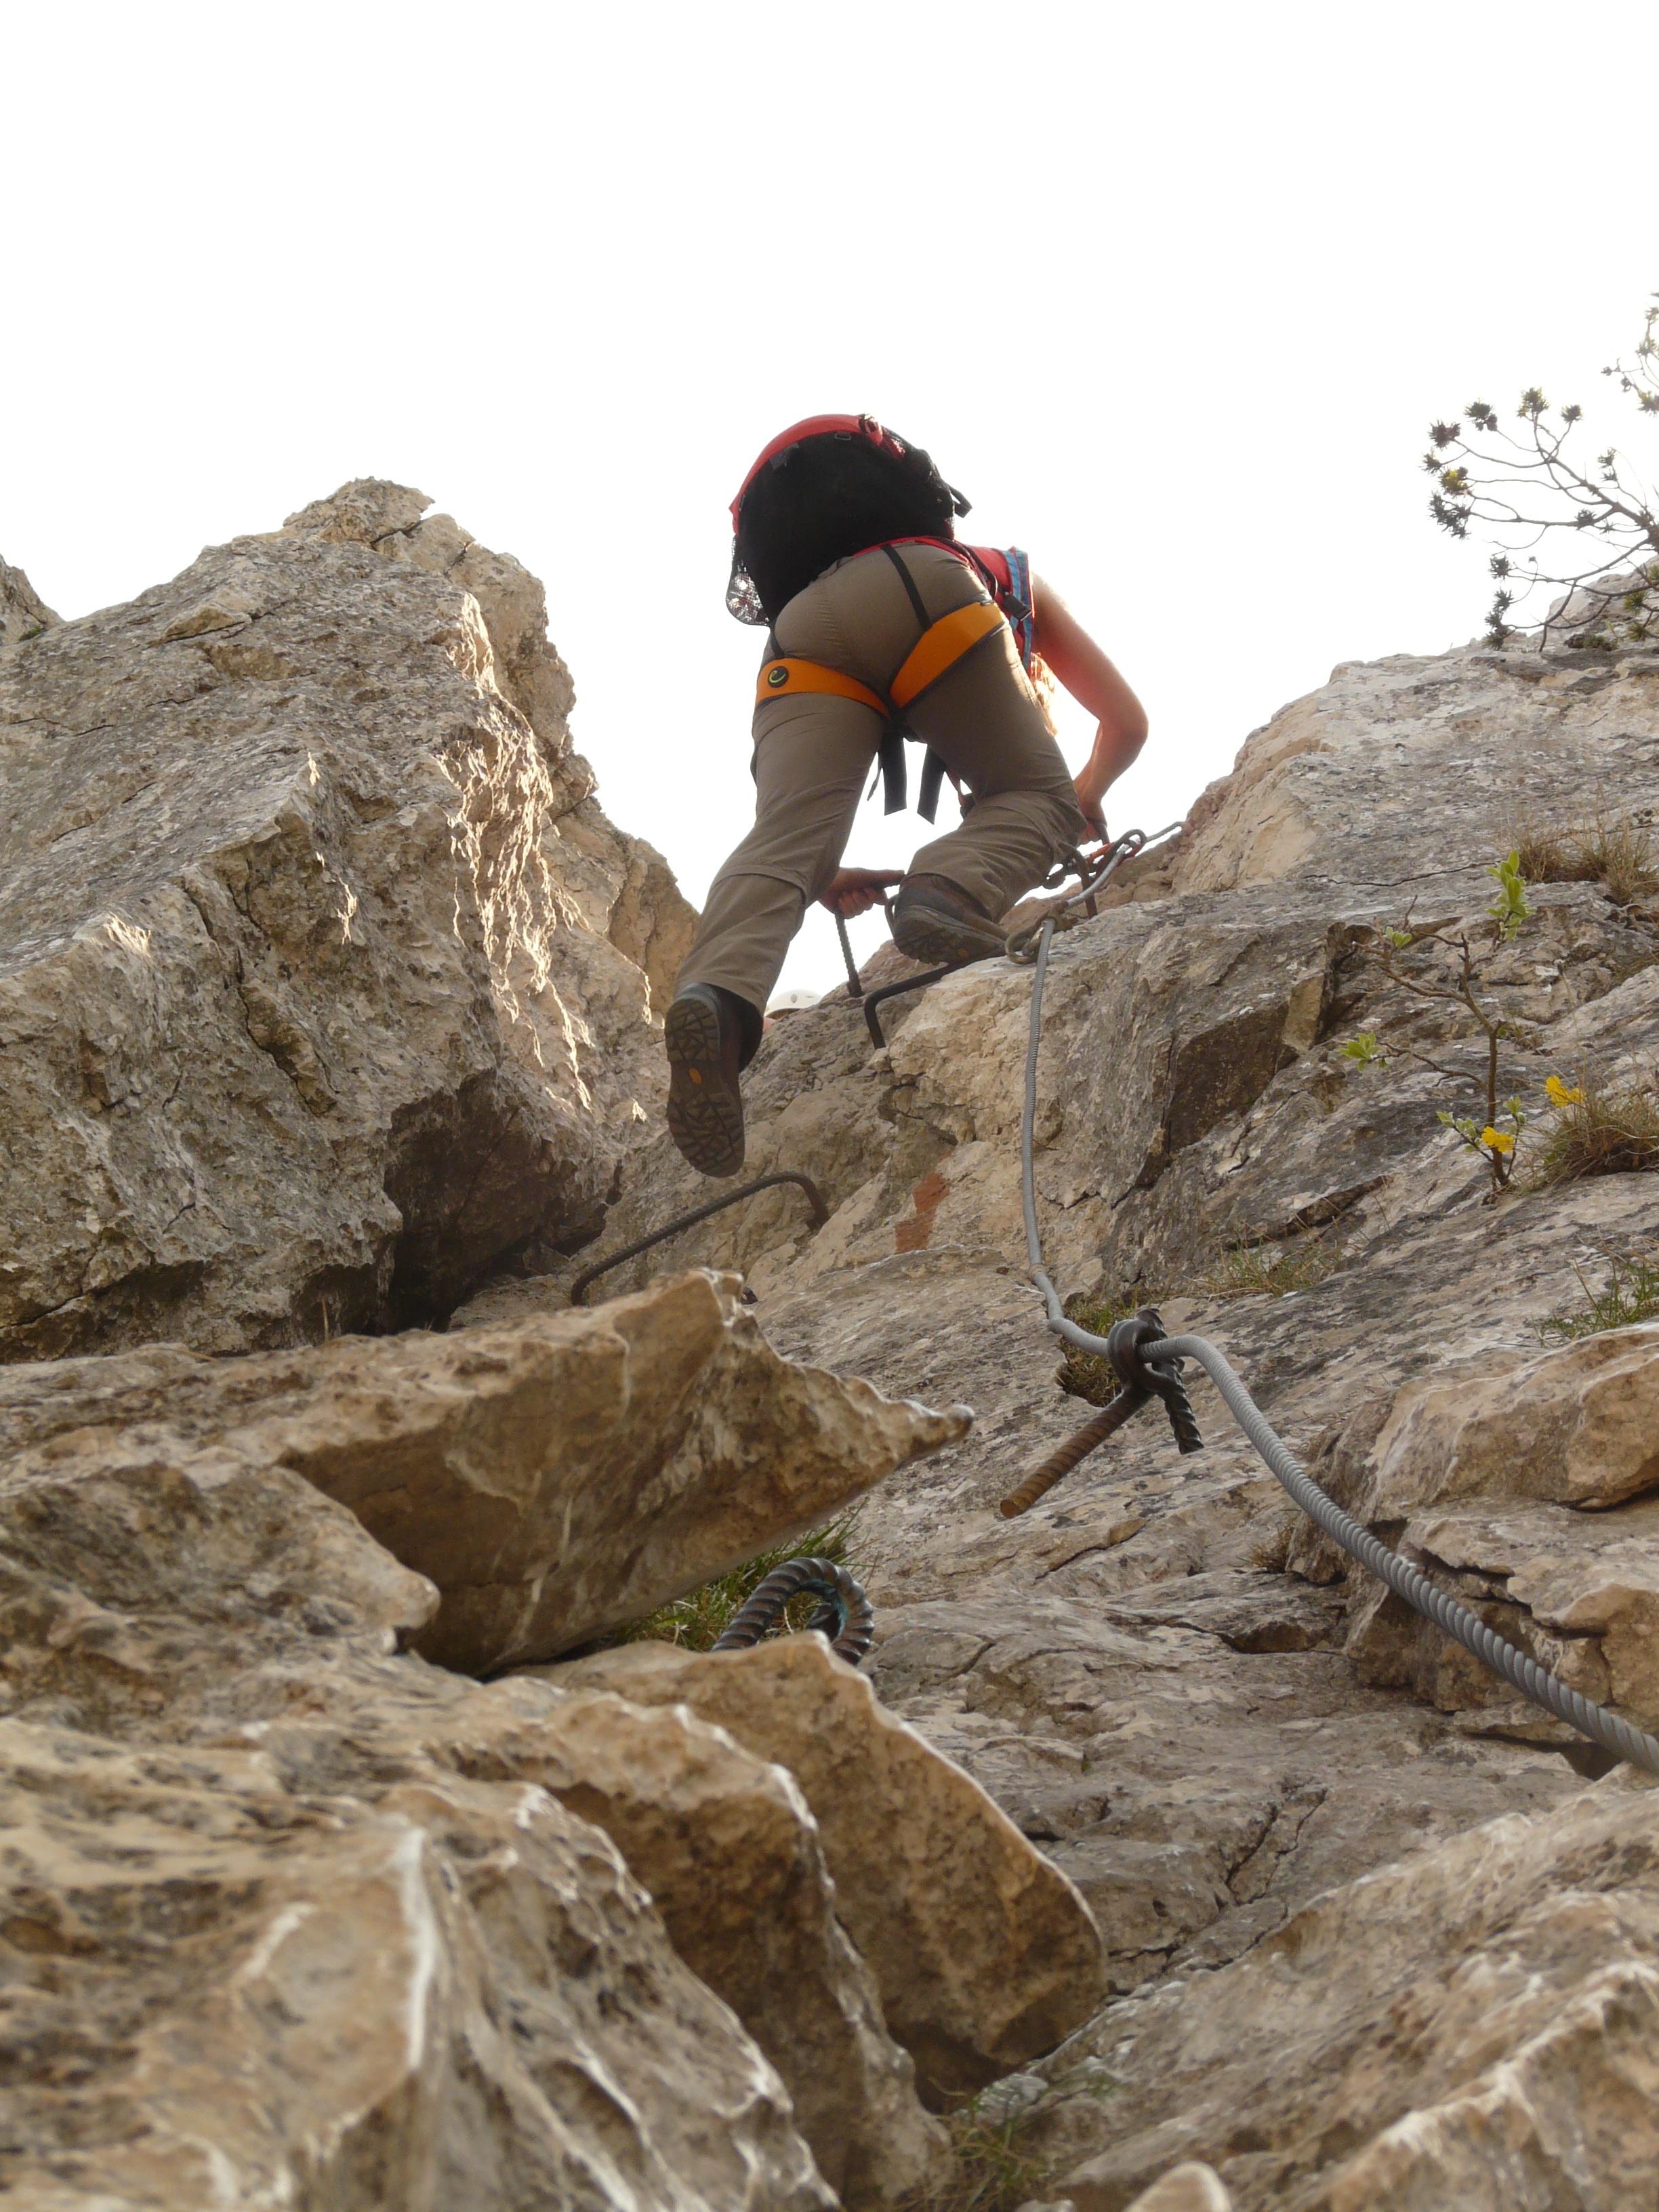 Kostenlose foto : Rock, Wandern, Abenteuer, eng, Cliff, Wanderung ...